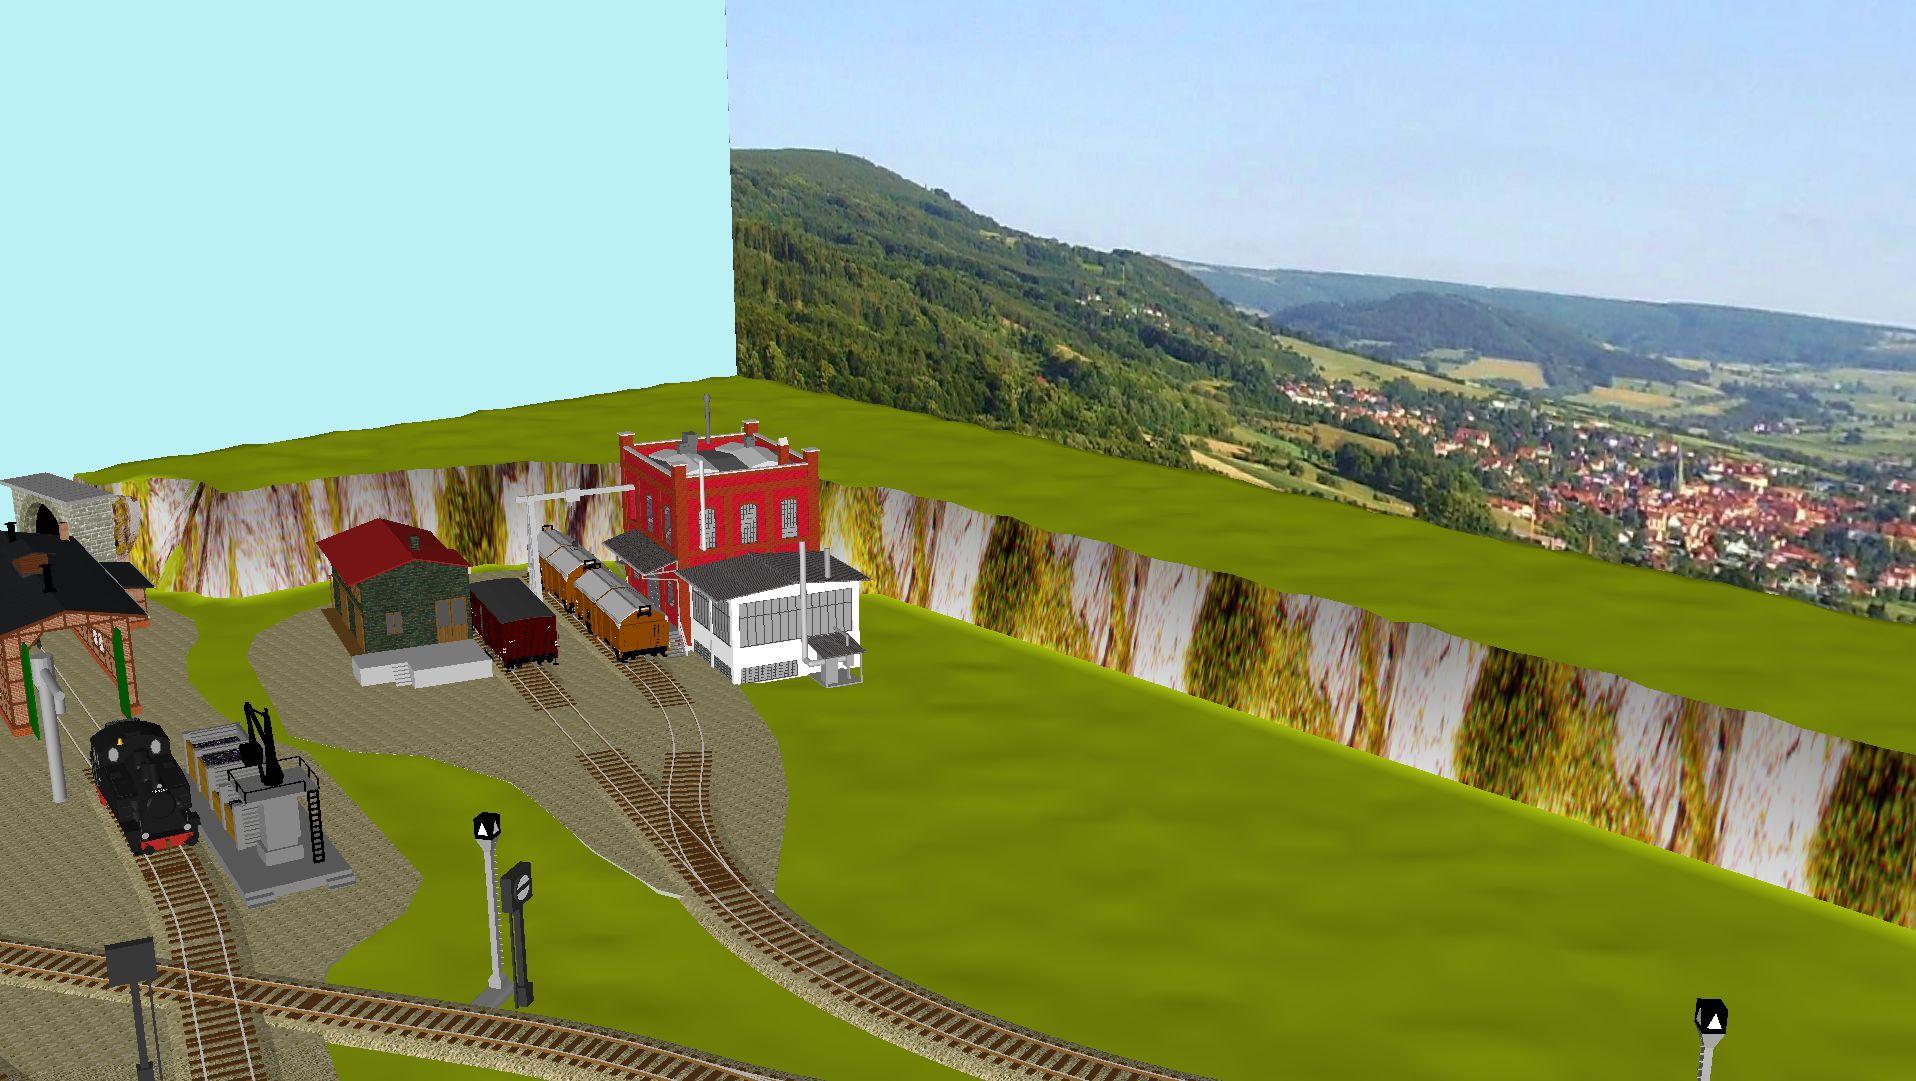 'ALBA Modellbahnpraxis' Band 1, Plan 5 Amp-1_5_m-gleis_jrg_aupkqi